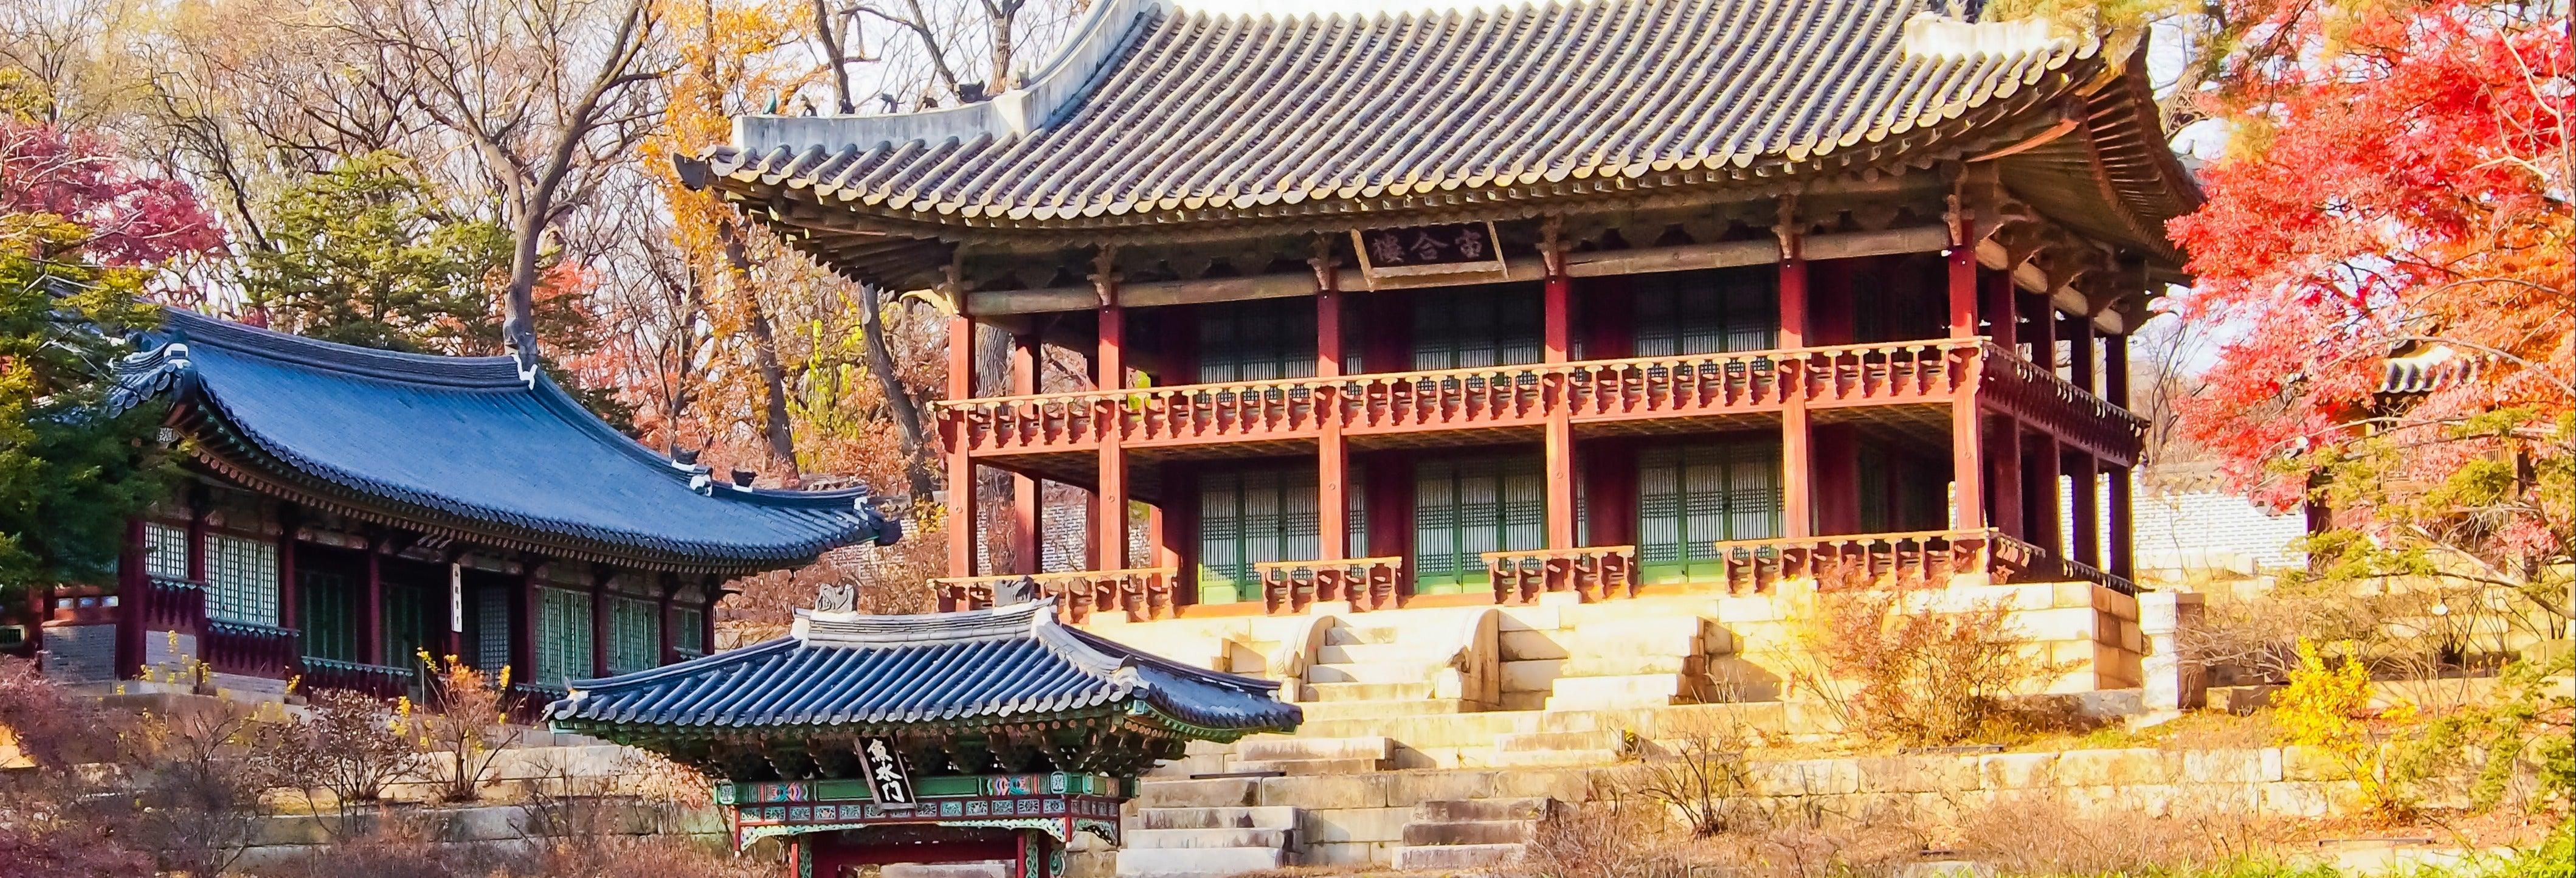 Changdeokgung Palace and Jongmyo Shrine Tour